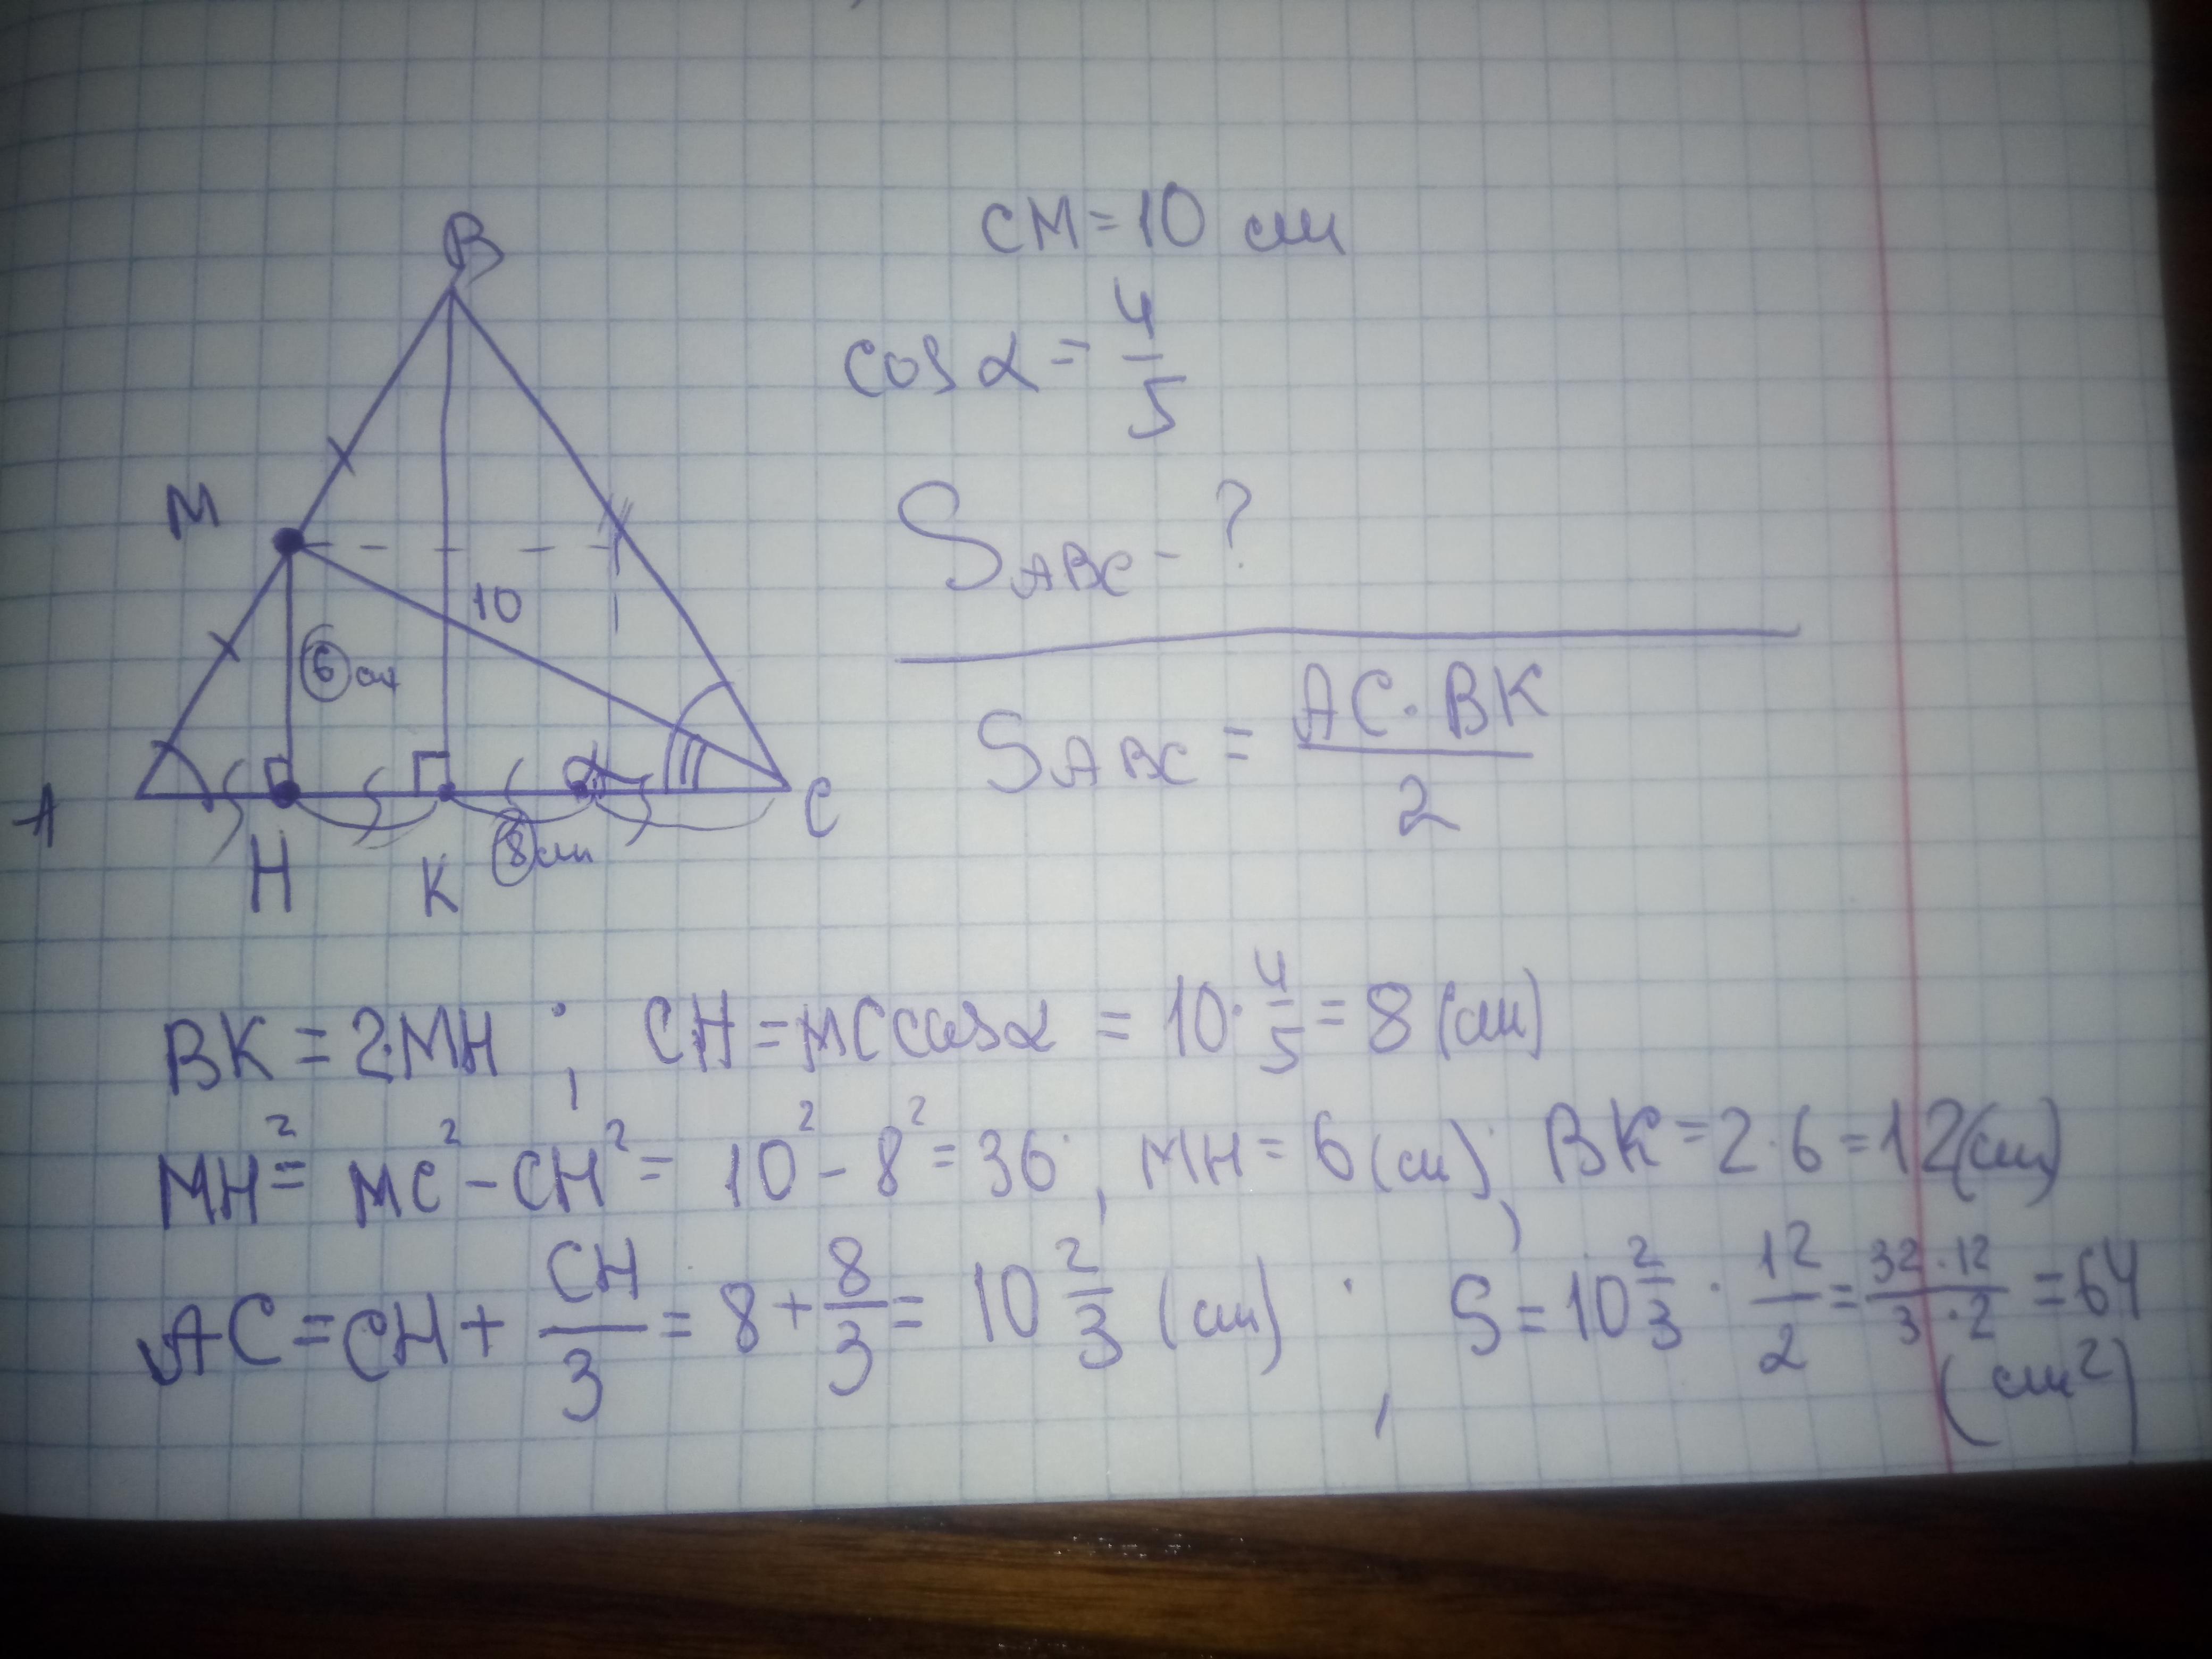 В равнобедренном треугольнике медиана на бедре -